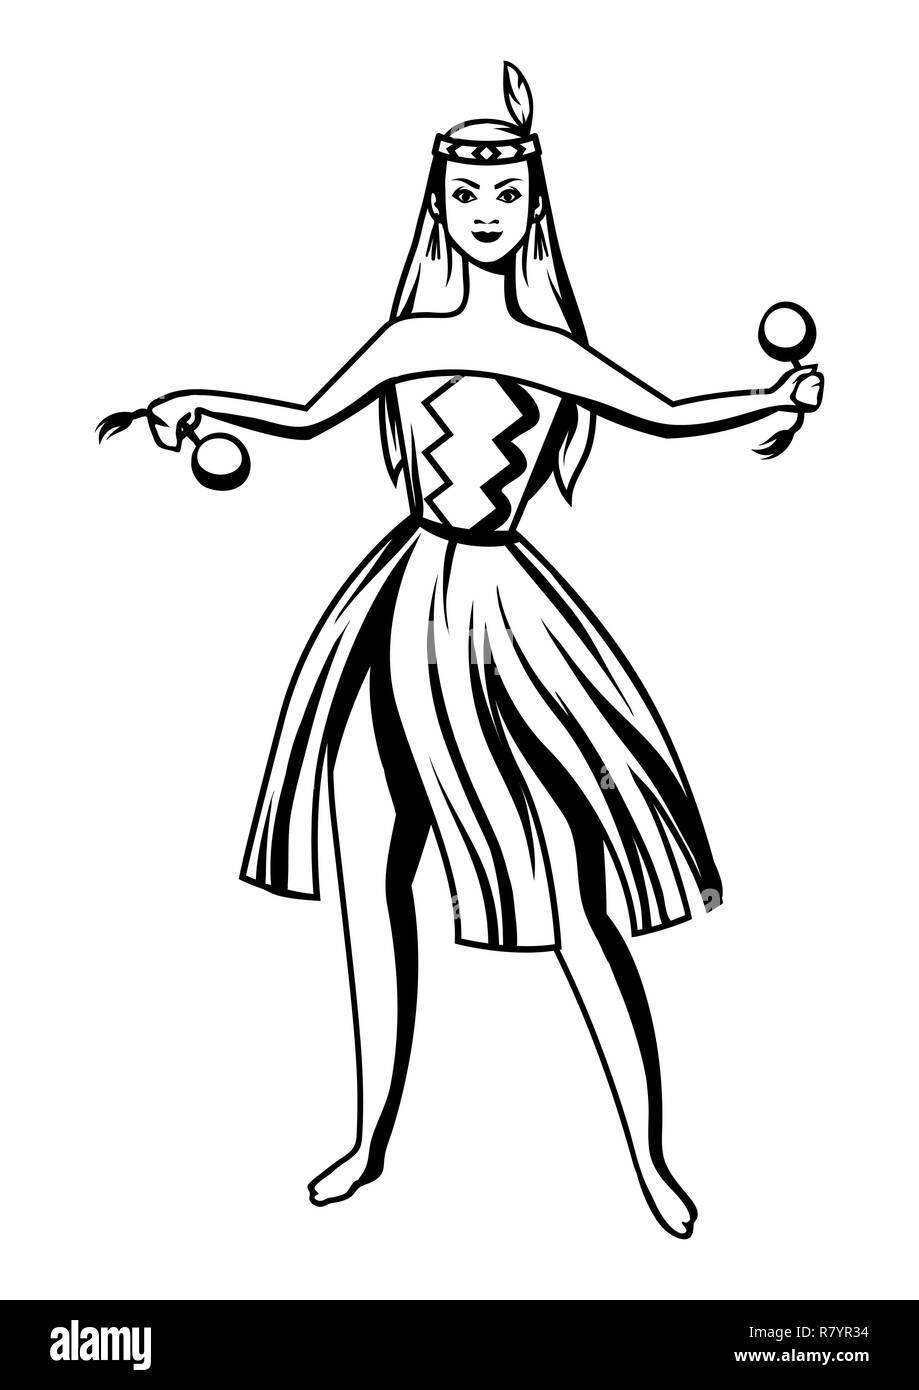 Black and white maori girl dancing. - Stock Vector